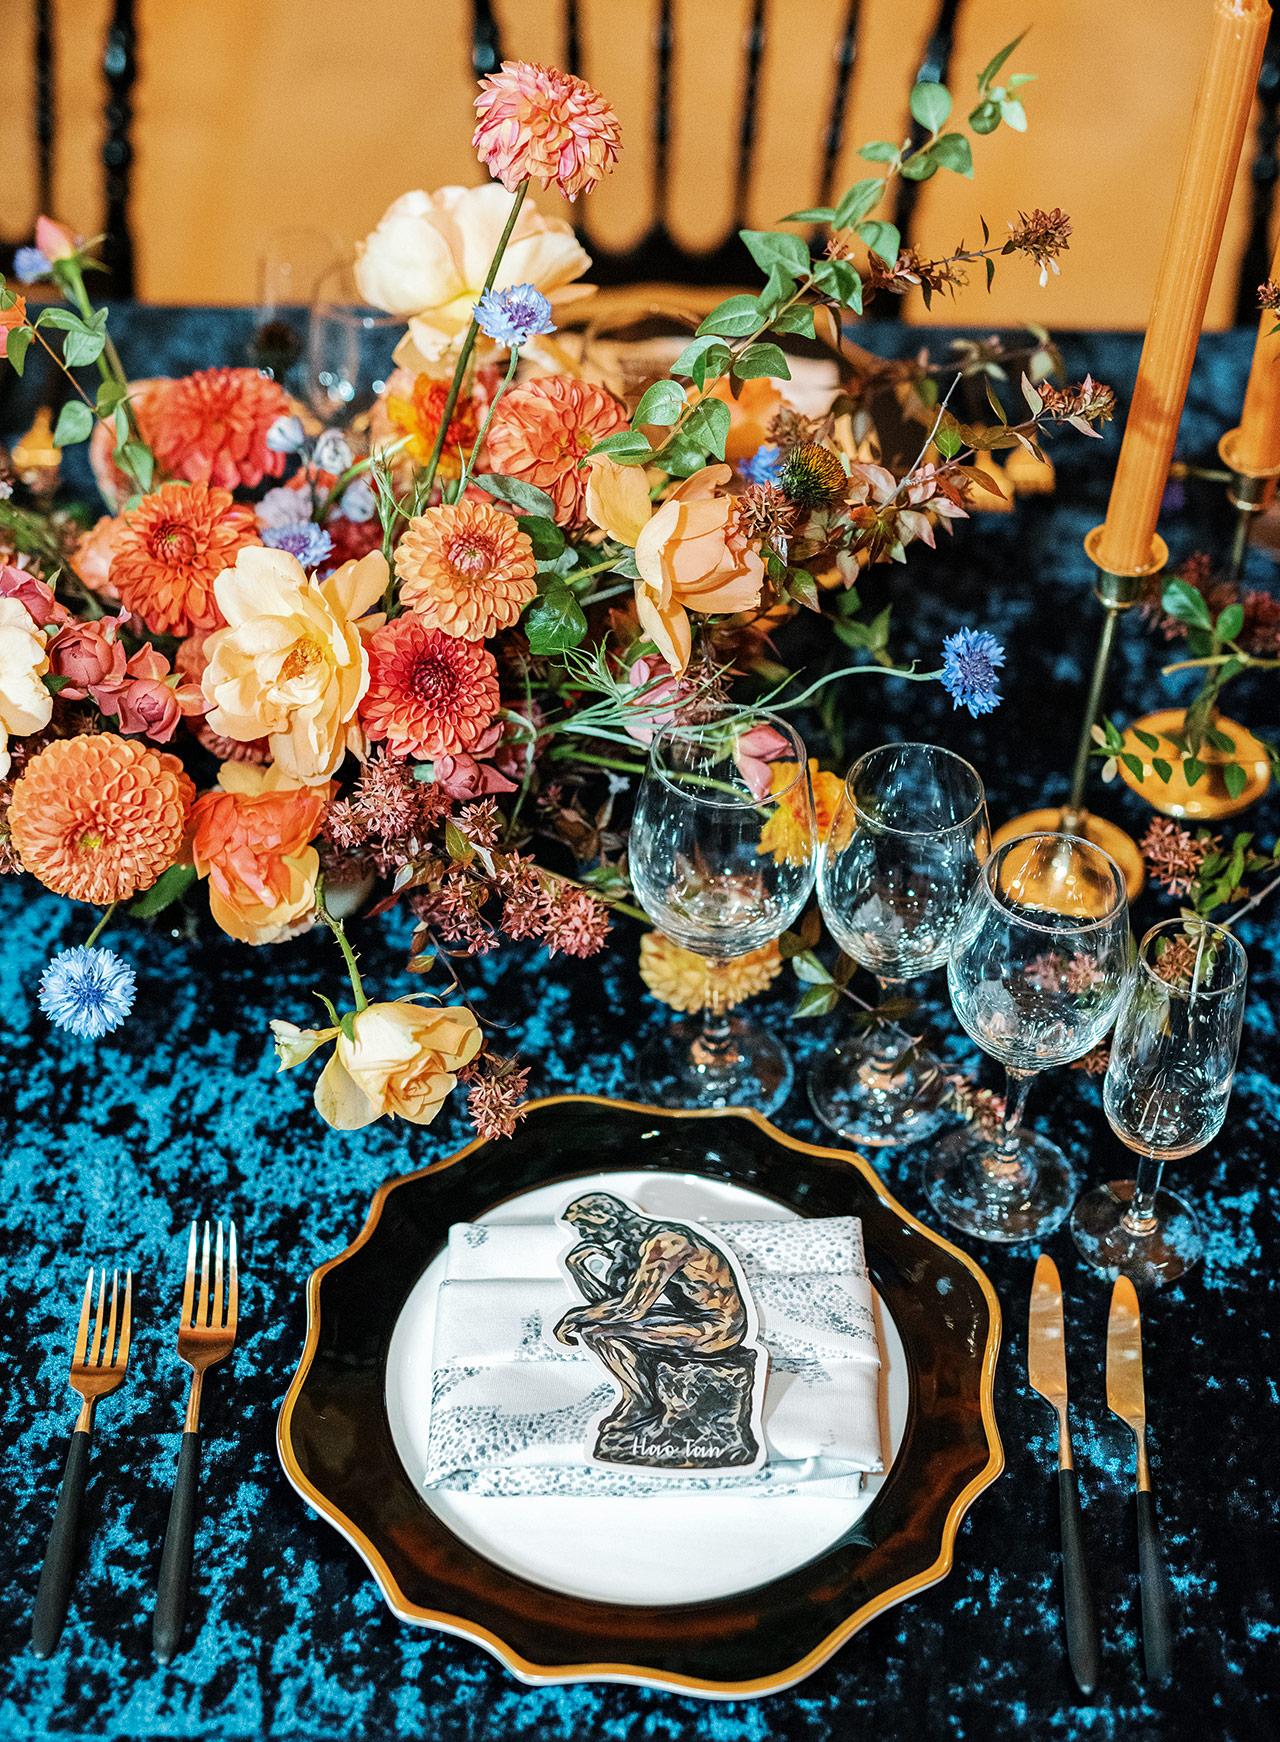 wedding reception table setting onyx gold flatware